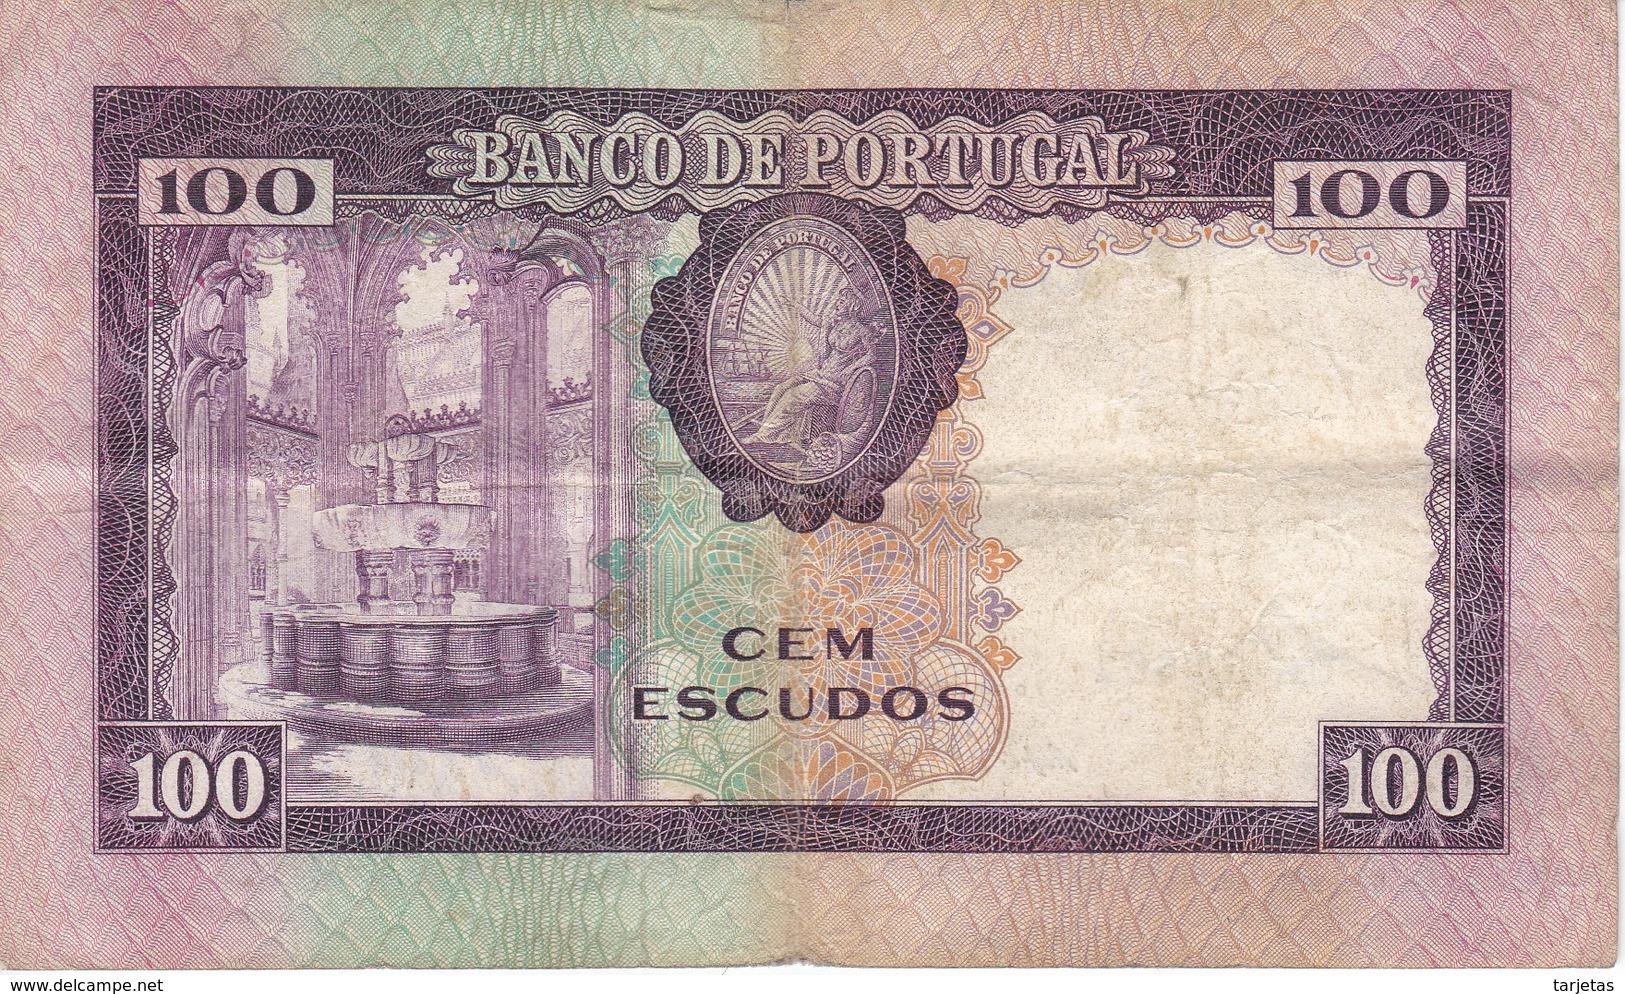 BILLETE DE PORTUGAL DE 100 ESCUDOS DEL AÑO 1961 SERIE UH   (BANKNOTE) - Portugal